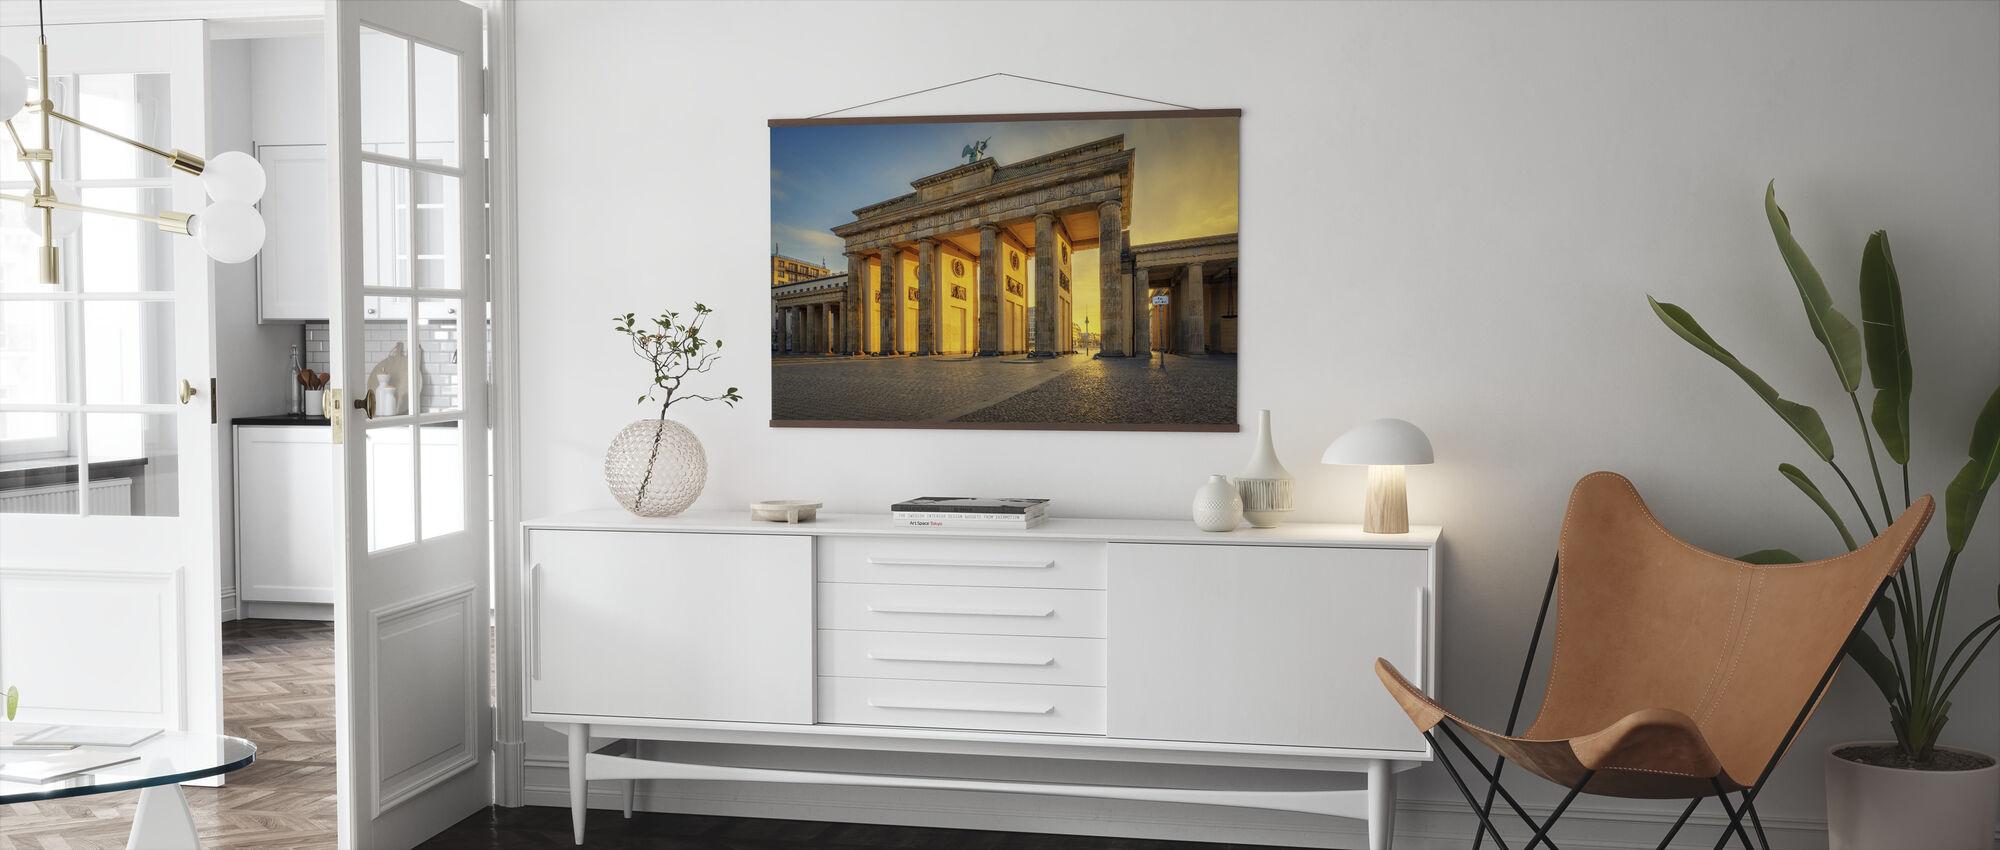 Pillars - Poster - Living Room